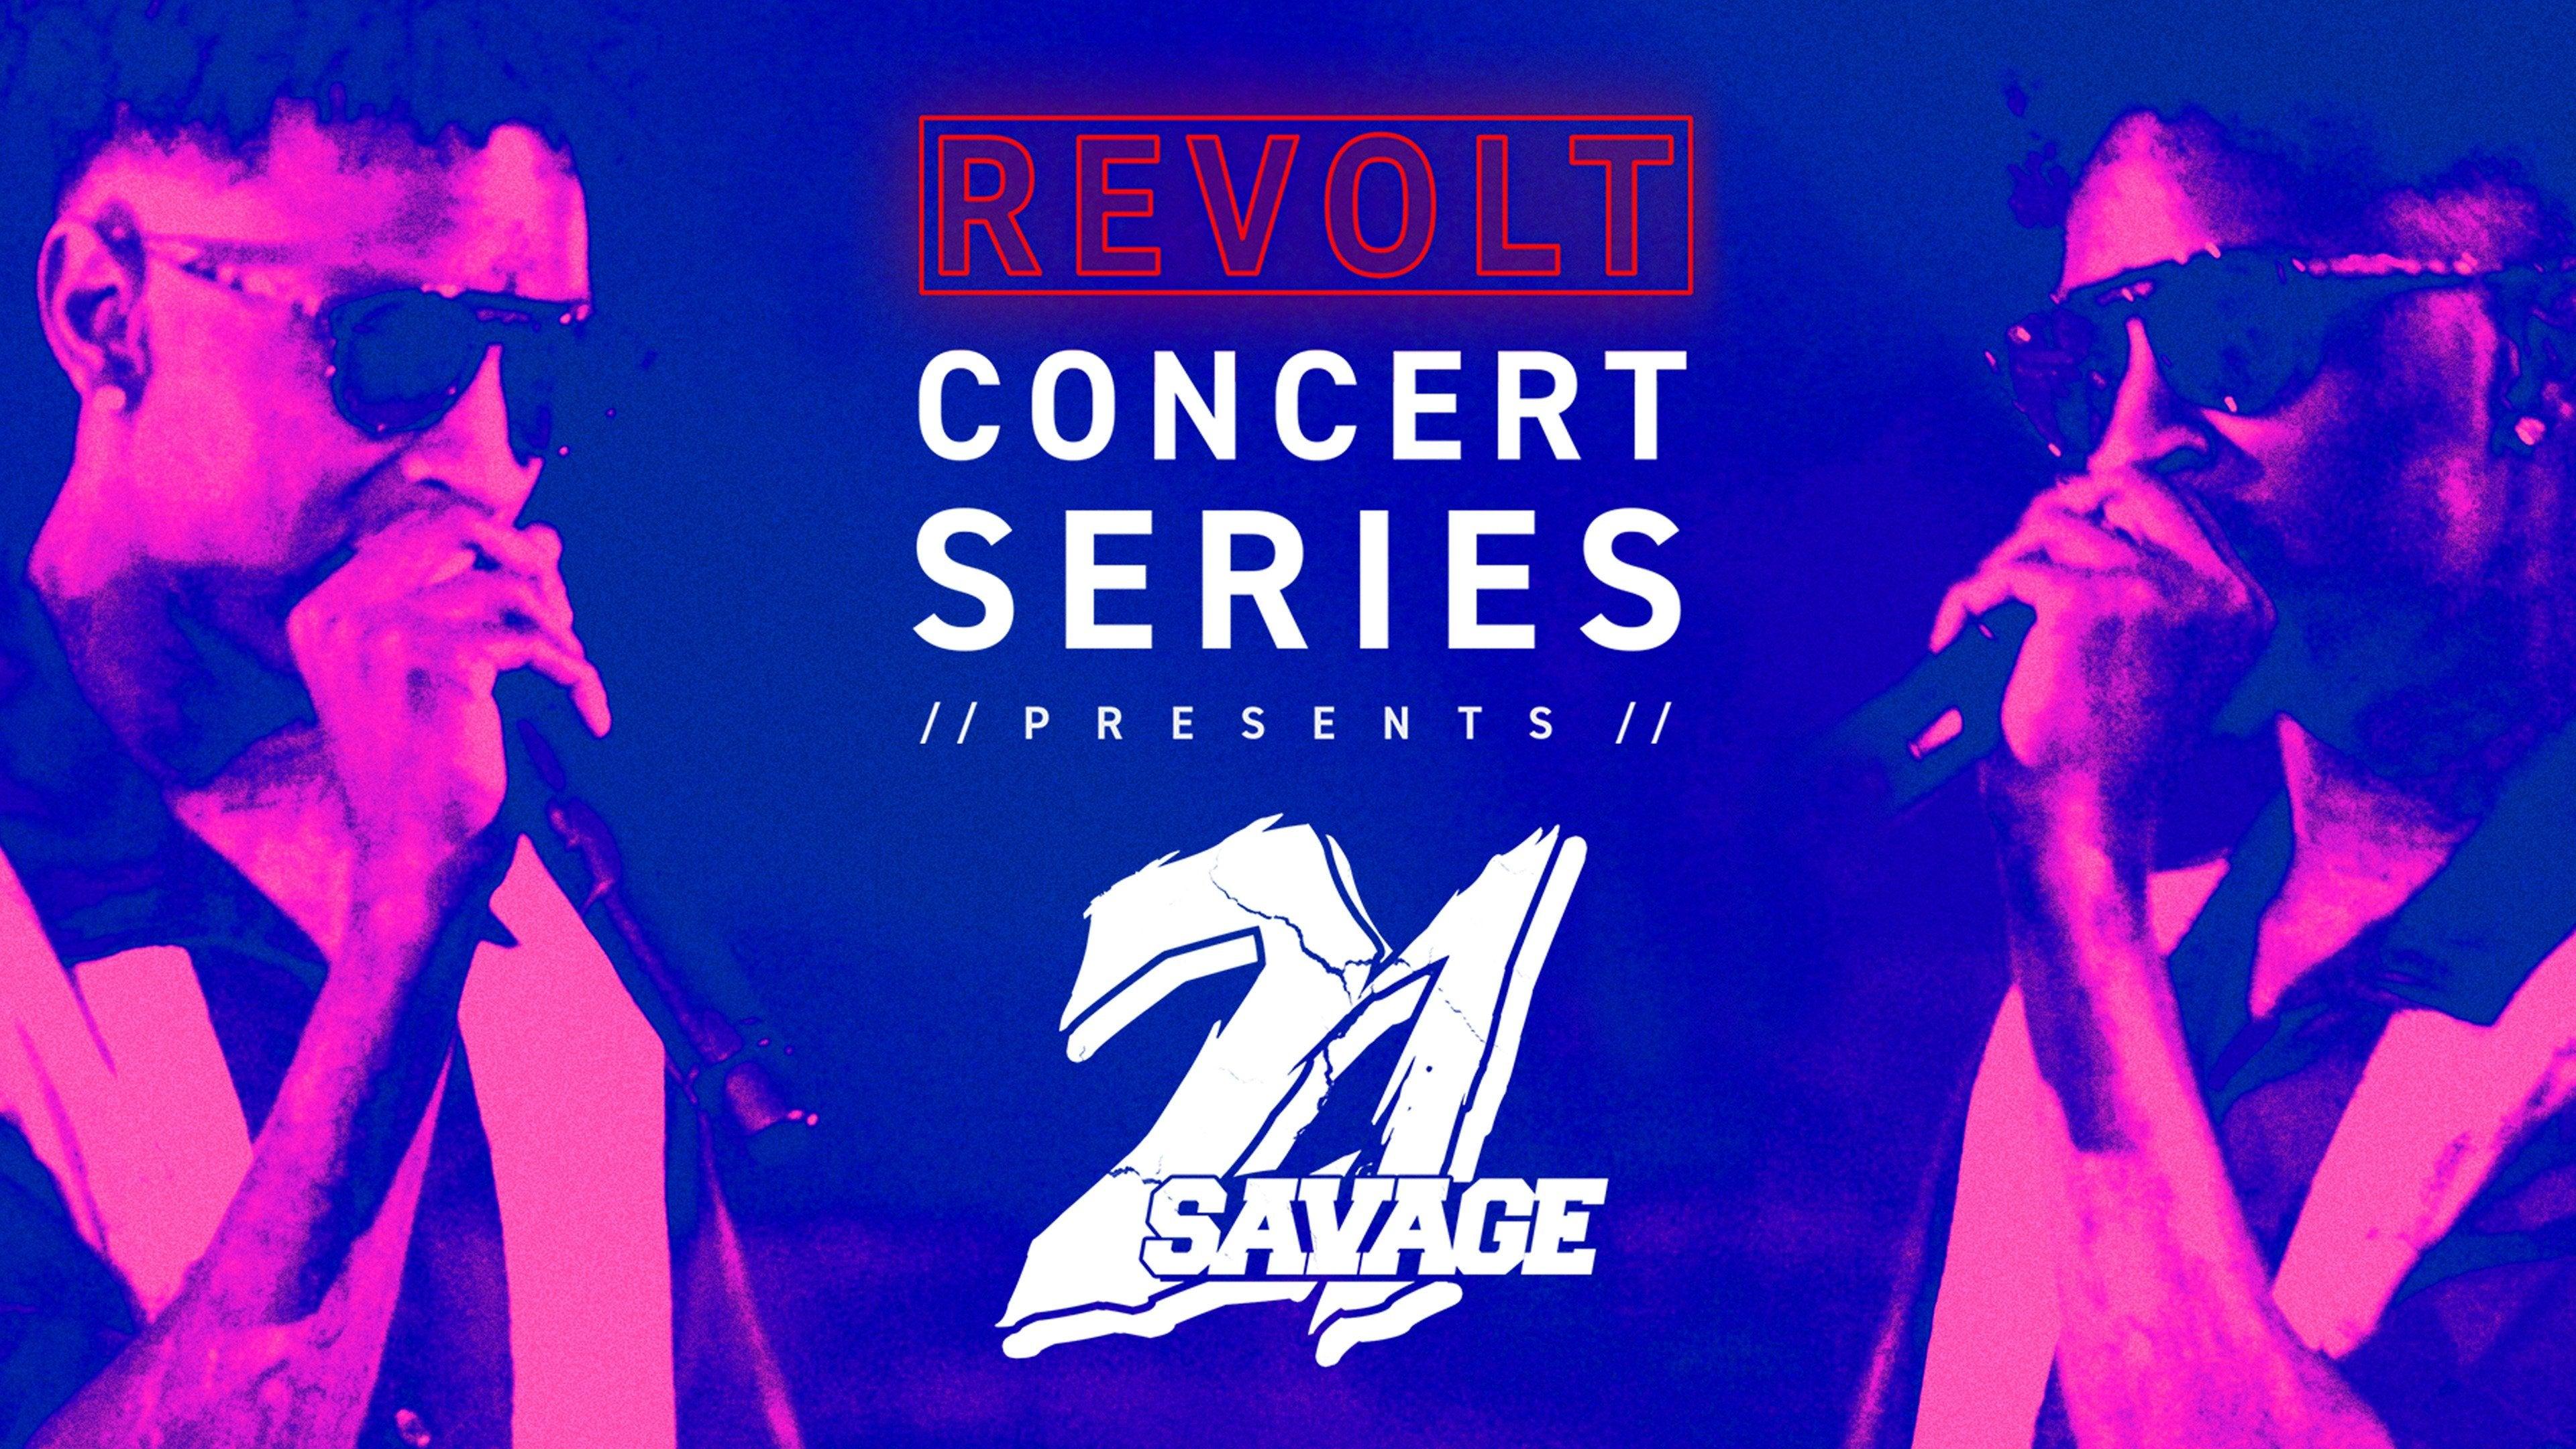 Revolt Concert Series Presents: 21 Savage